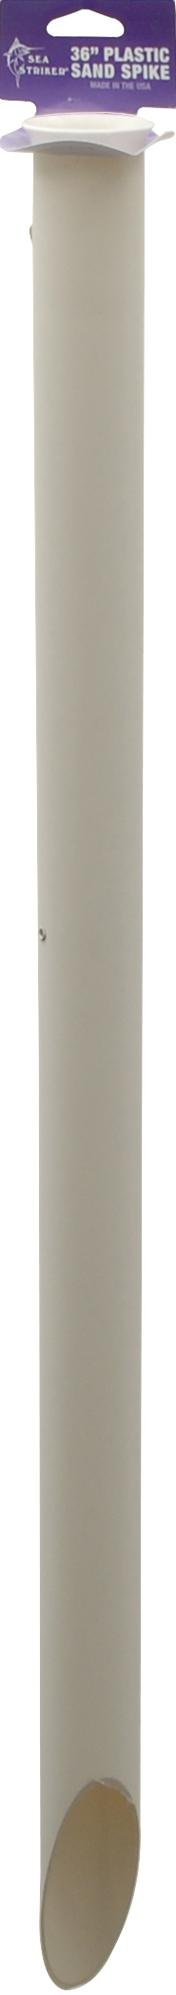 Sea Striker 36-2P PVC Sand Spike, 36-Inch Package